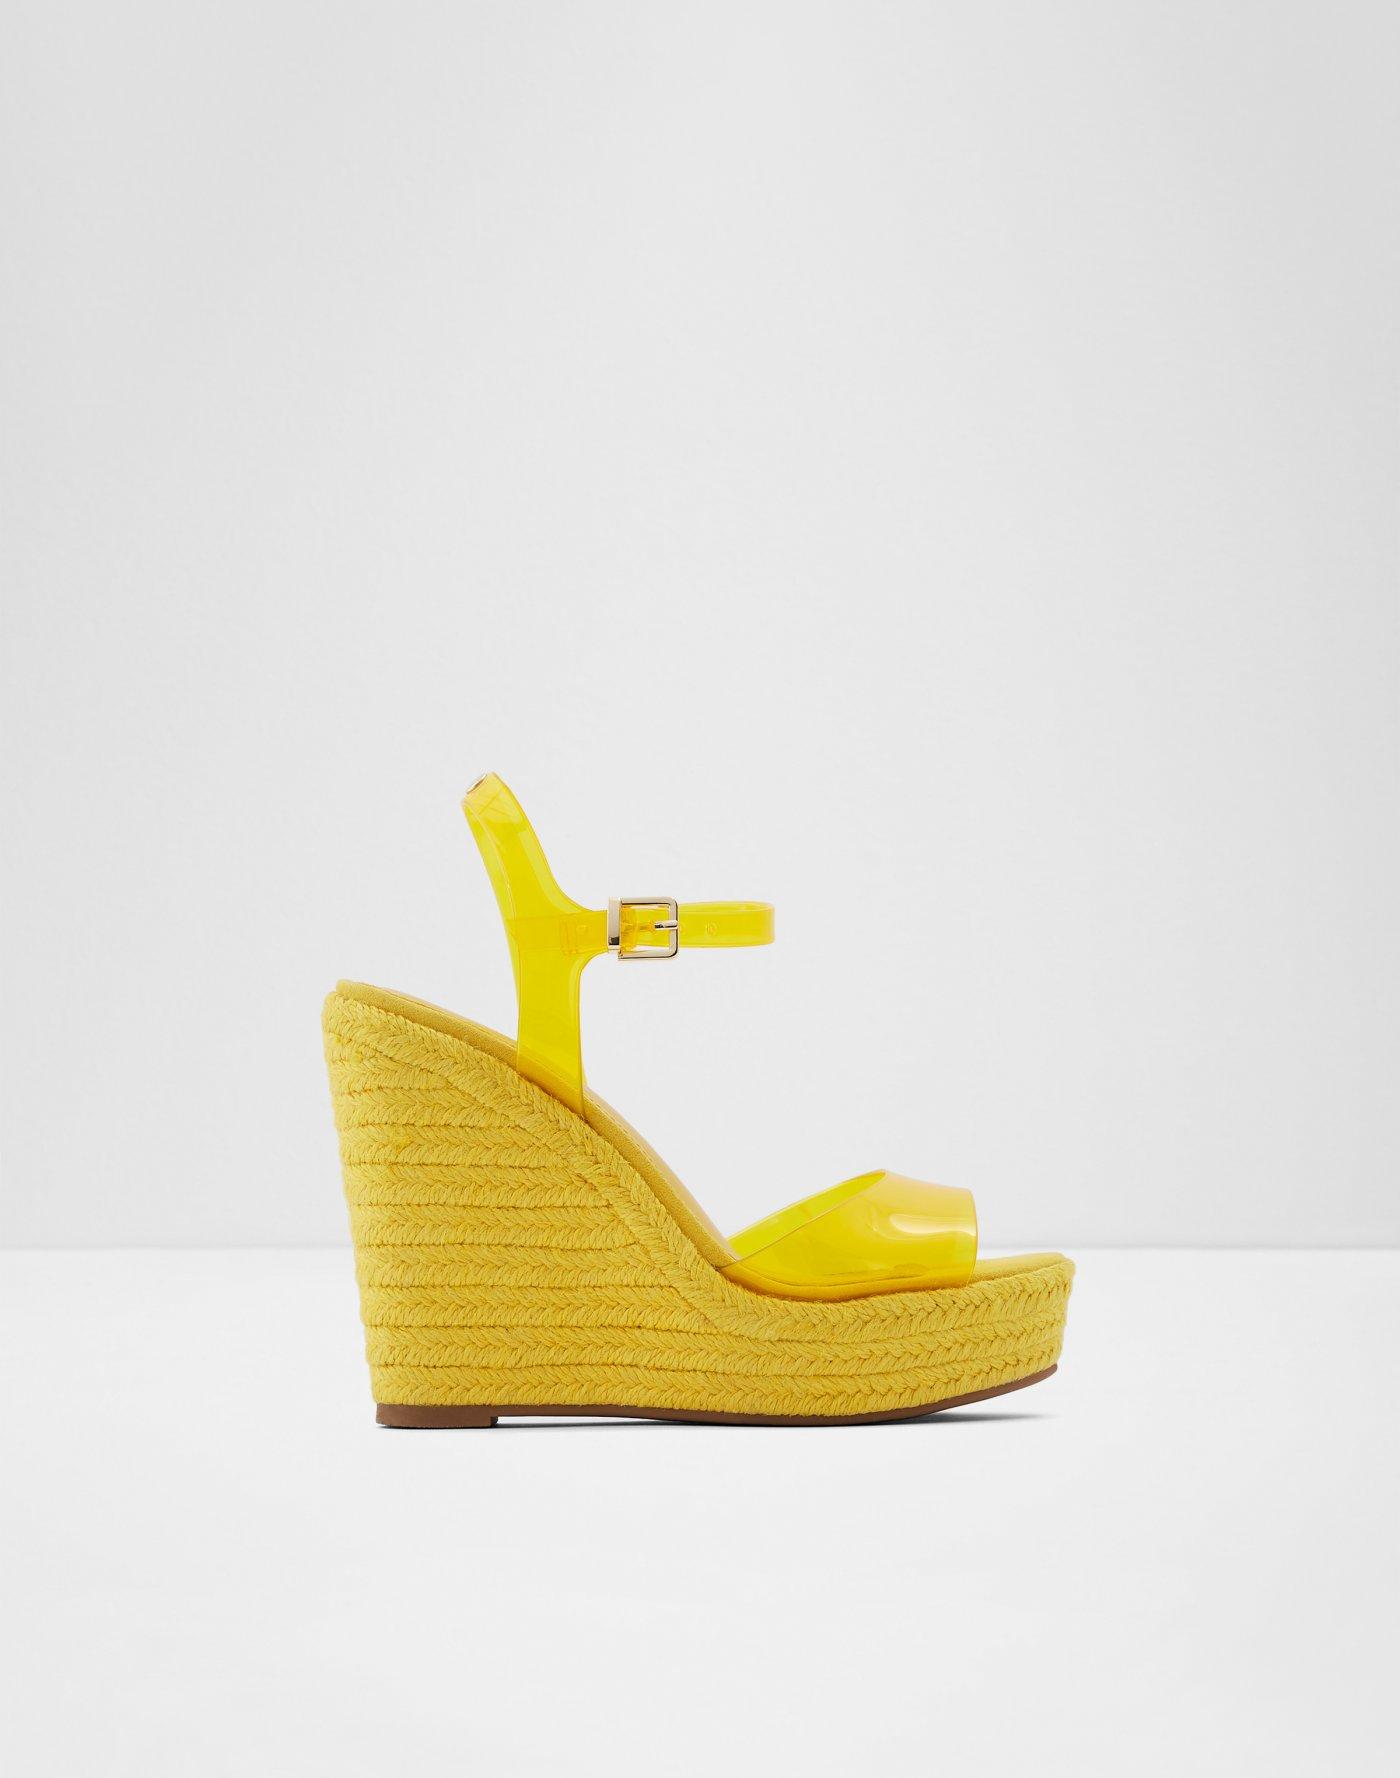 ccda39154bf Wedge Sandals | Women Sandals | ALDO US | Aldoshoes.com US